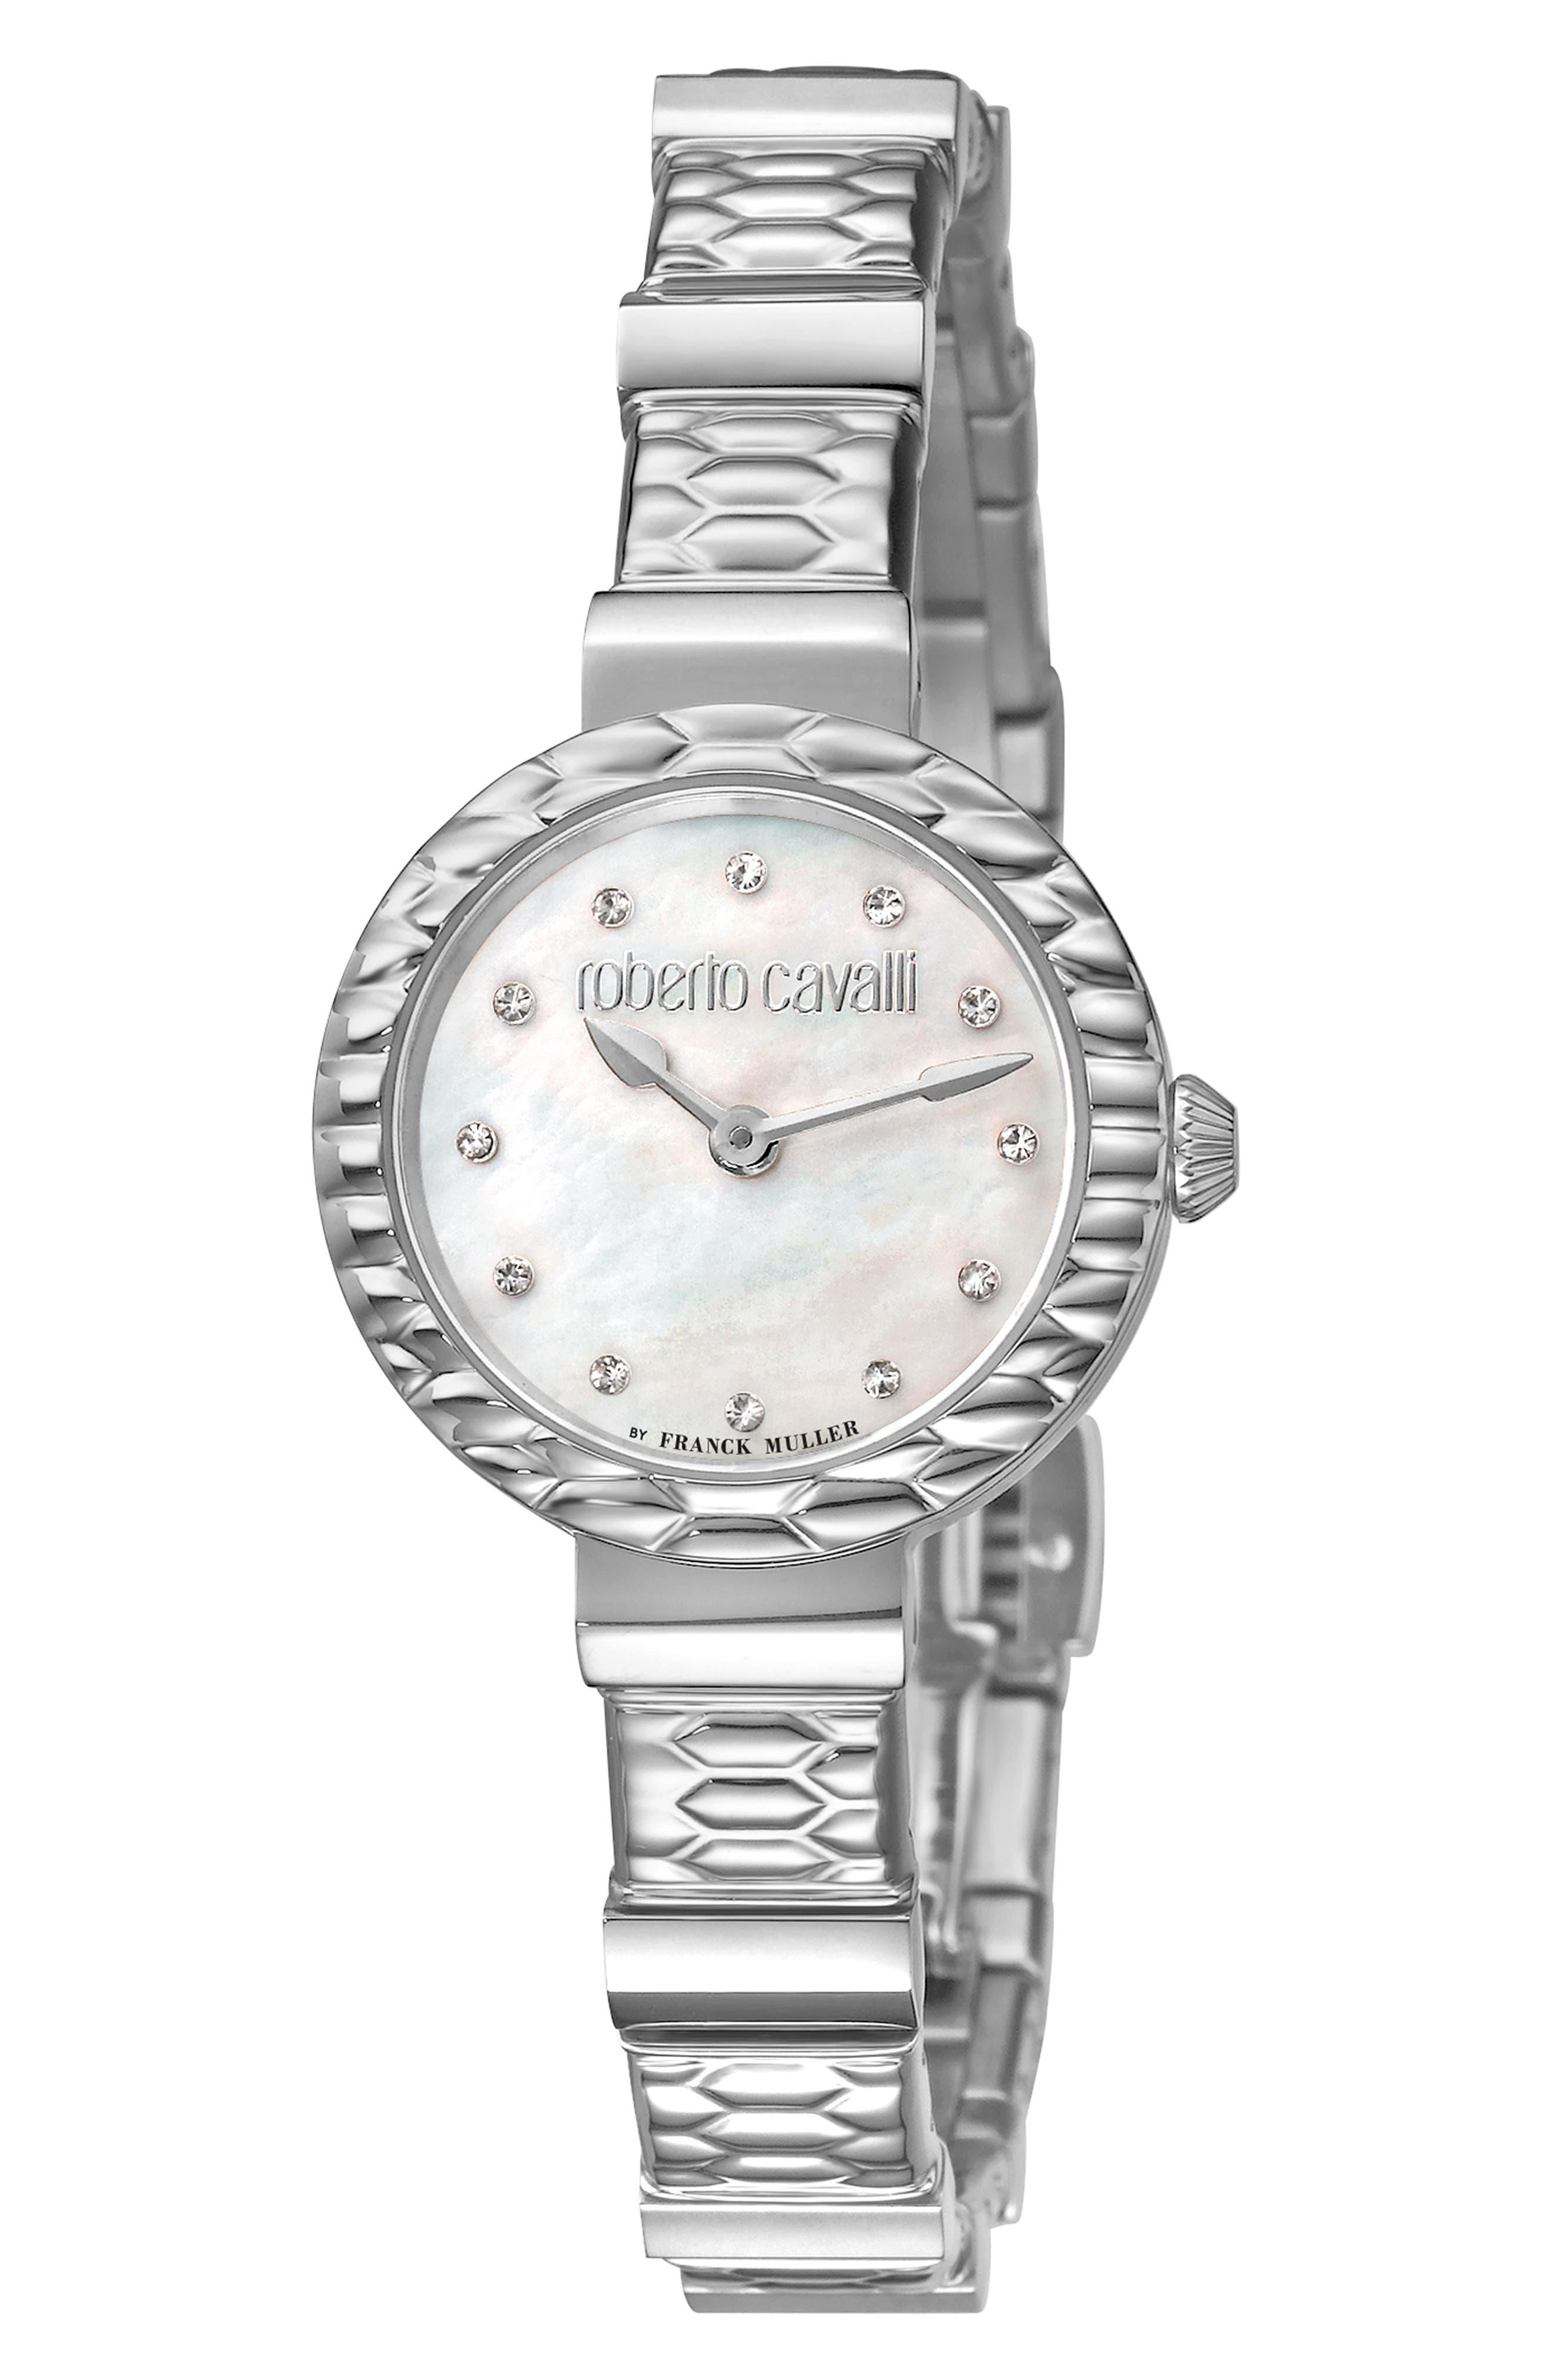 ROBERTO CAVALLI BY FRANCK MULLER Scala Diamond Bracelet Watch, 26Mm in Silver/ White Mop/ Silver